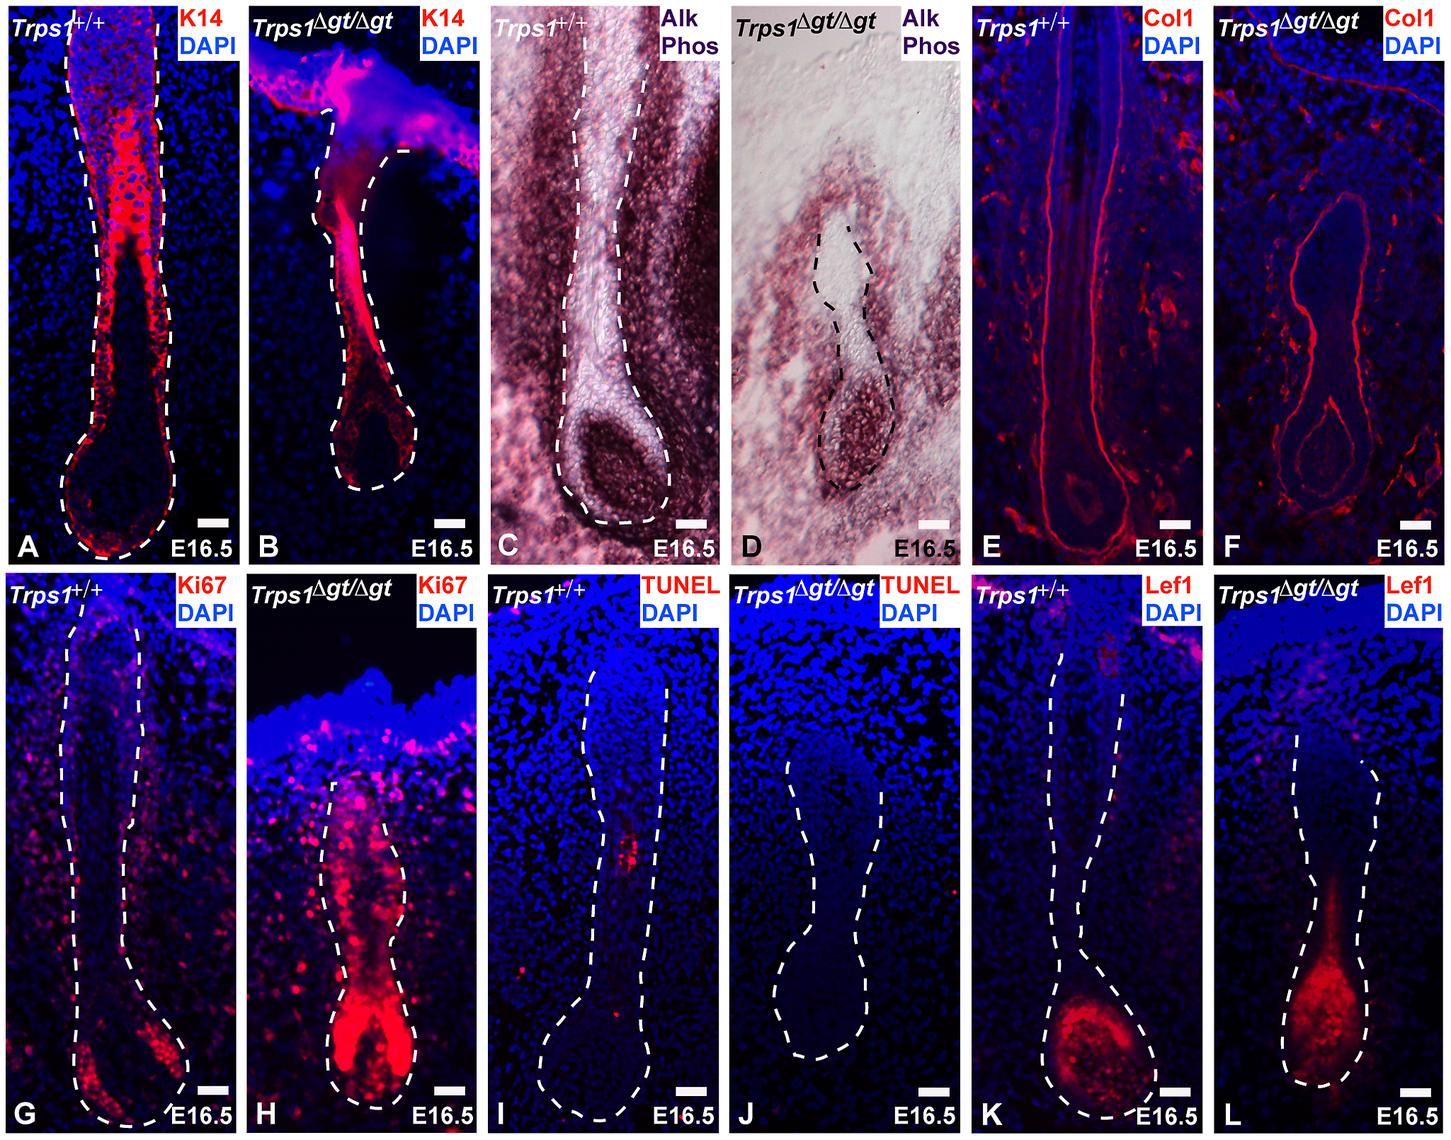 <i>Trps1<sup>Δgt/Δgt</sup></i> vibrissae follicles exhibit increased levels of proliferation.